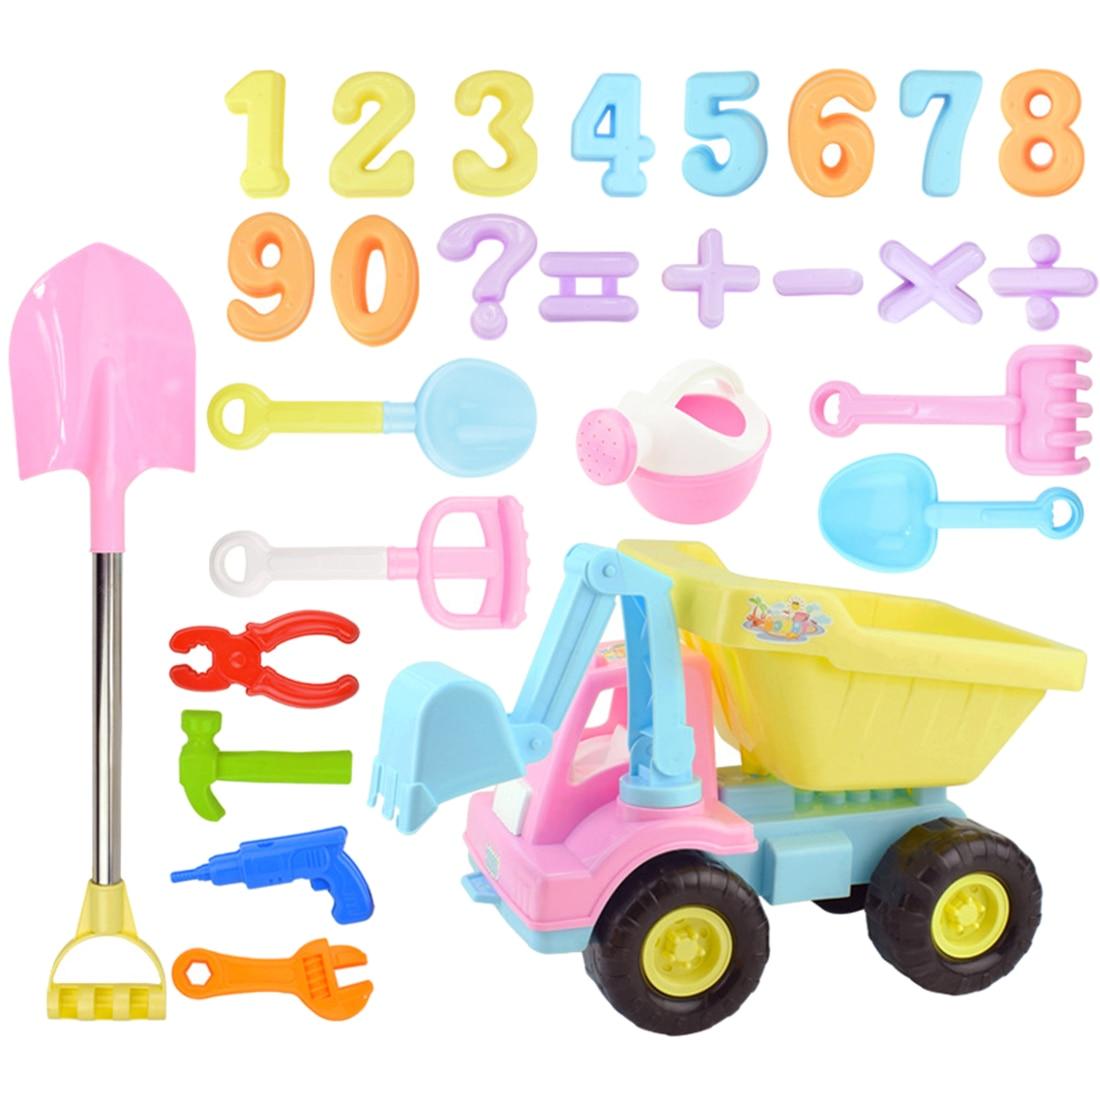 Summer Baby Beach Portable Kids Toy Organizer Storage Bag Outdoor Beach Shell Sand Bag Drop Shipping 8a25 Home Storage & Organization